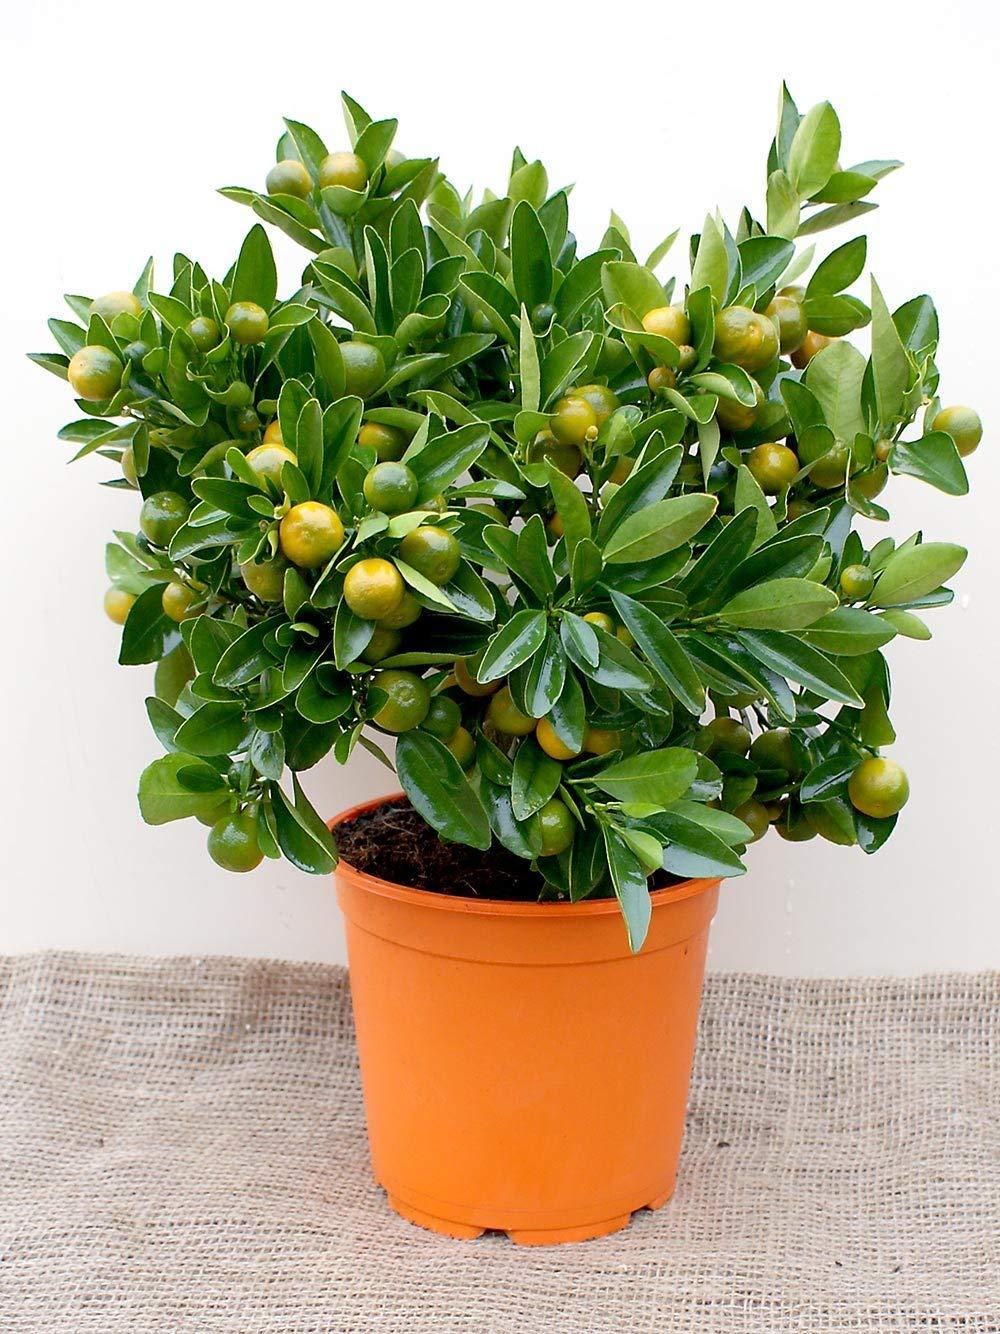 IDEA HIGH Calamondin Tree (Miniature Orange) by HATCHMATIC (Image #1)